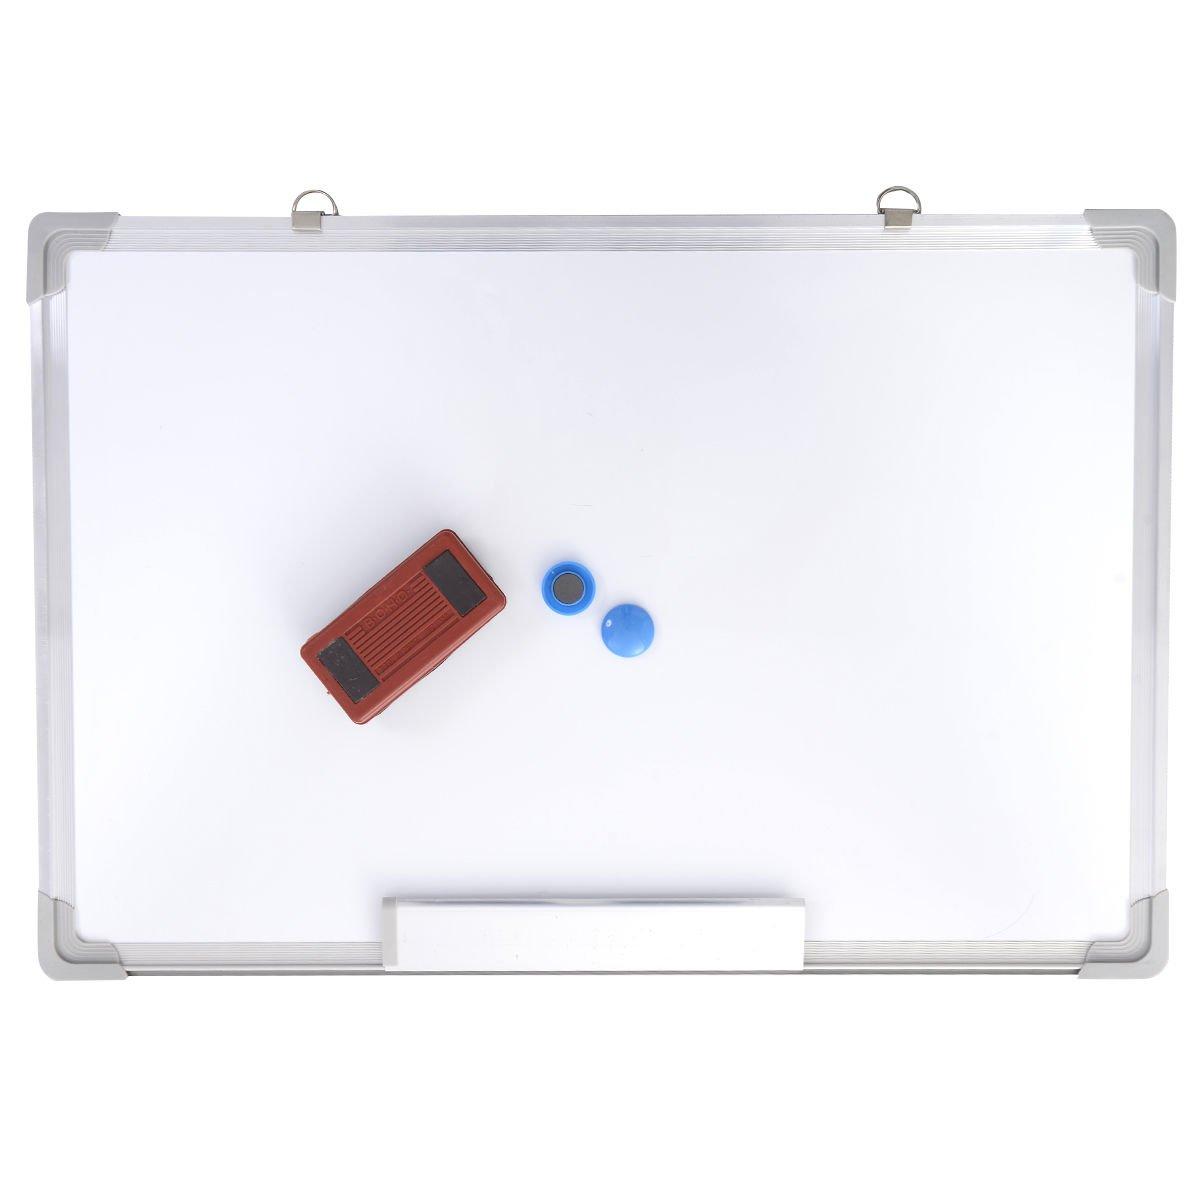 24x16 Single Side Magnetic Writing Whiteboard Dry Erase Board Office Eraser